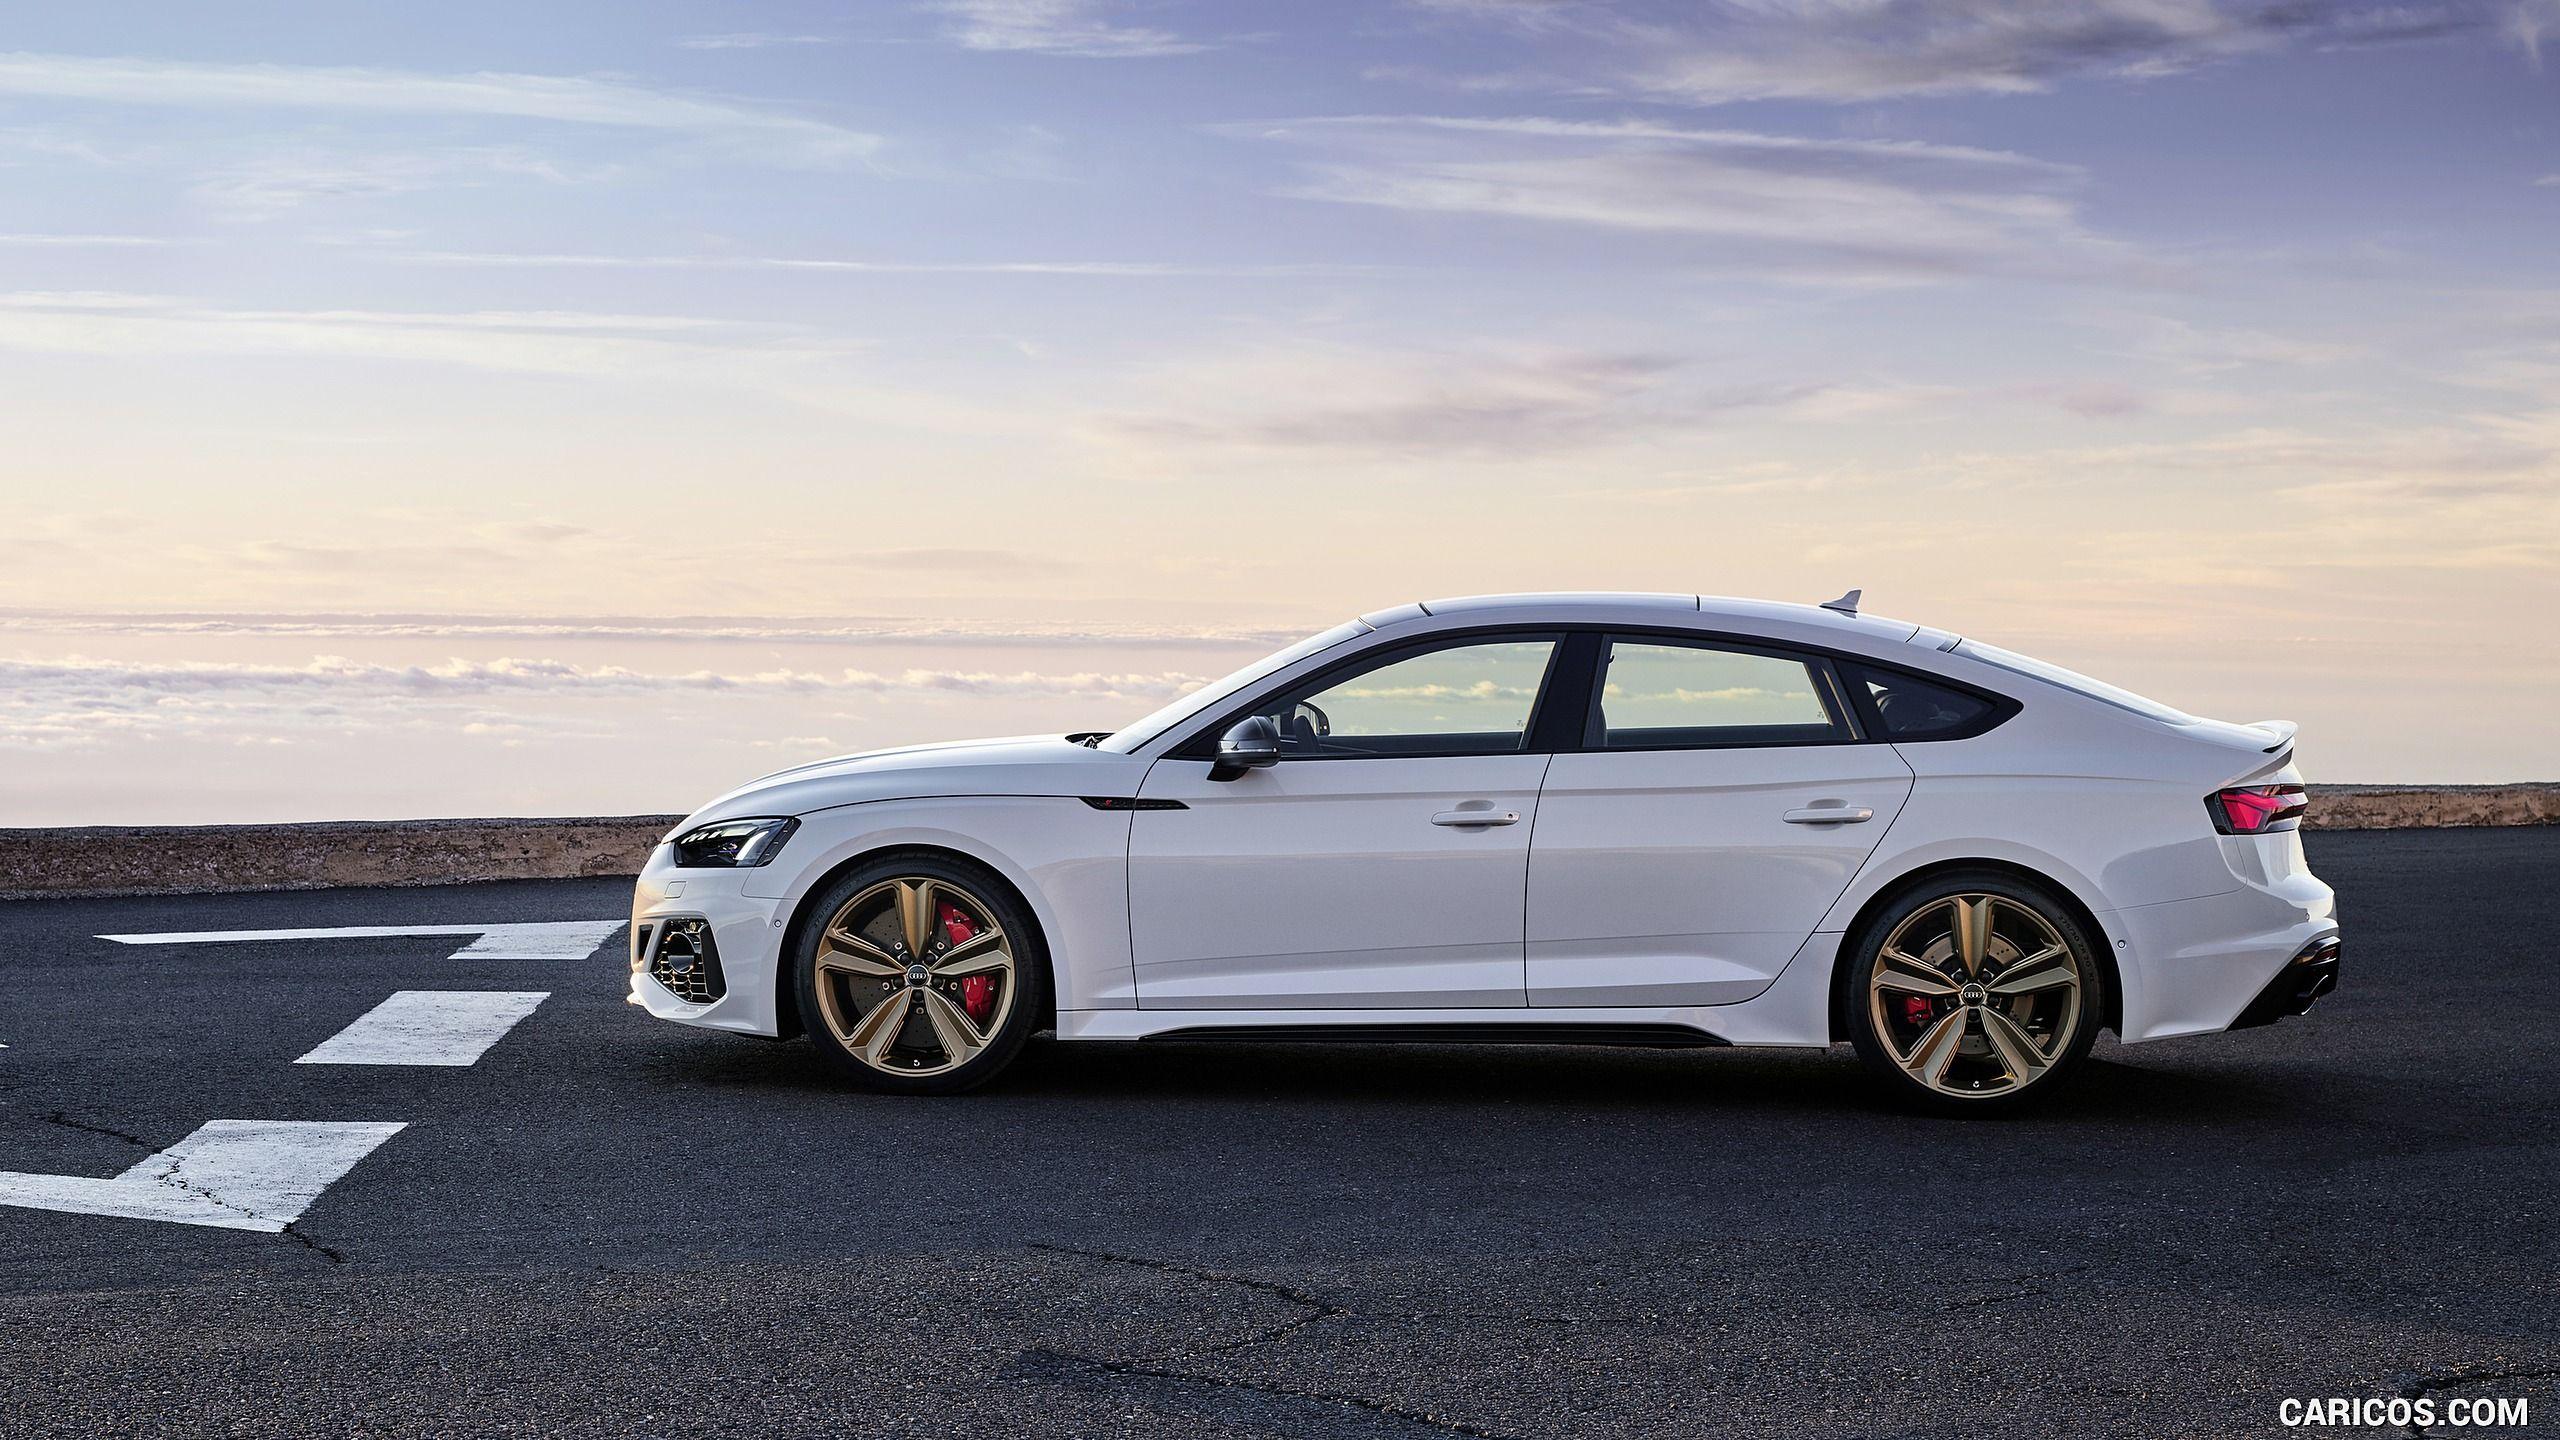 2020 Audi Rs 5 Sportback Color Glacier White Side Hd 2020 Audi Audi Rs Audi Rs 5